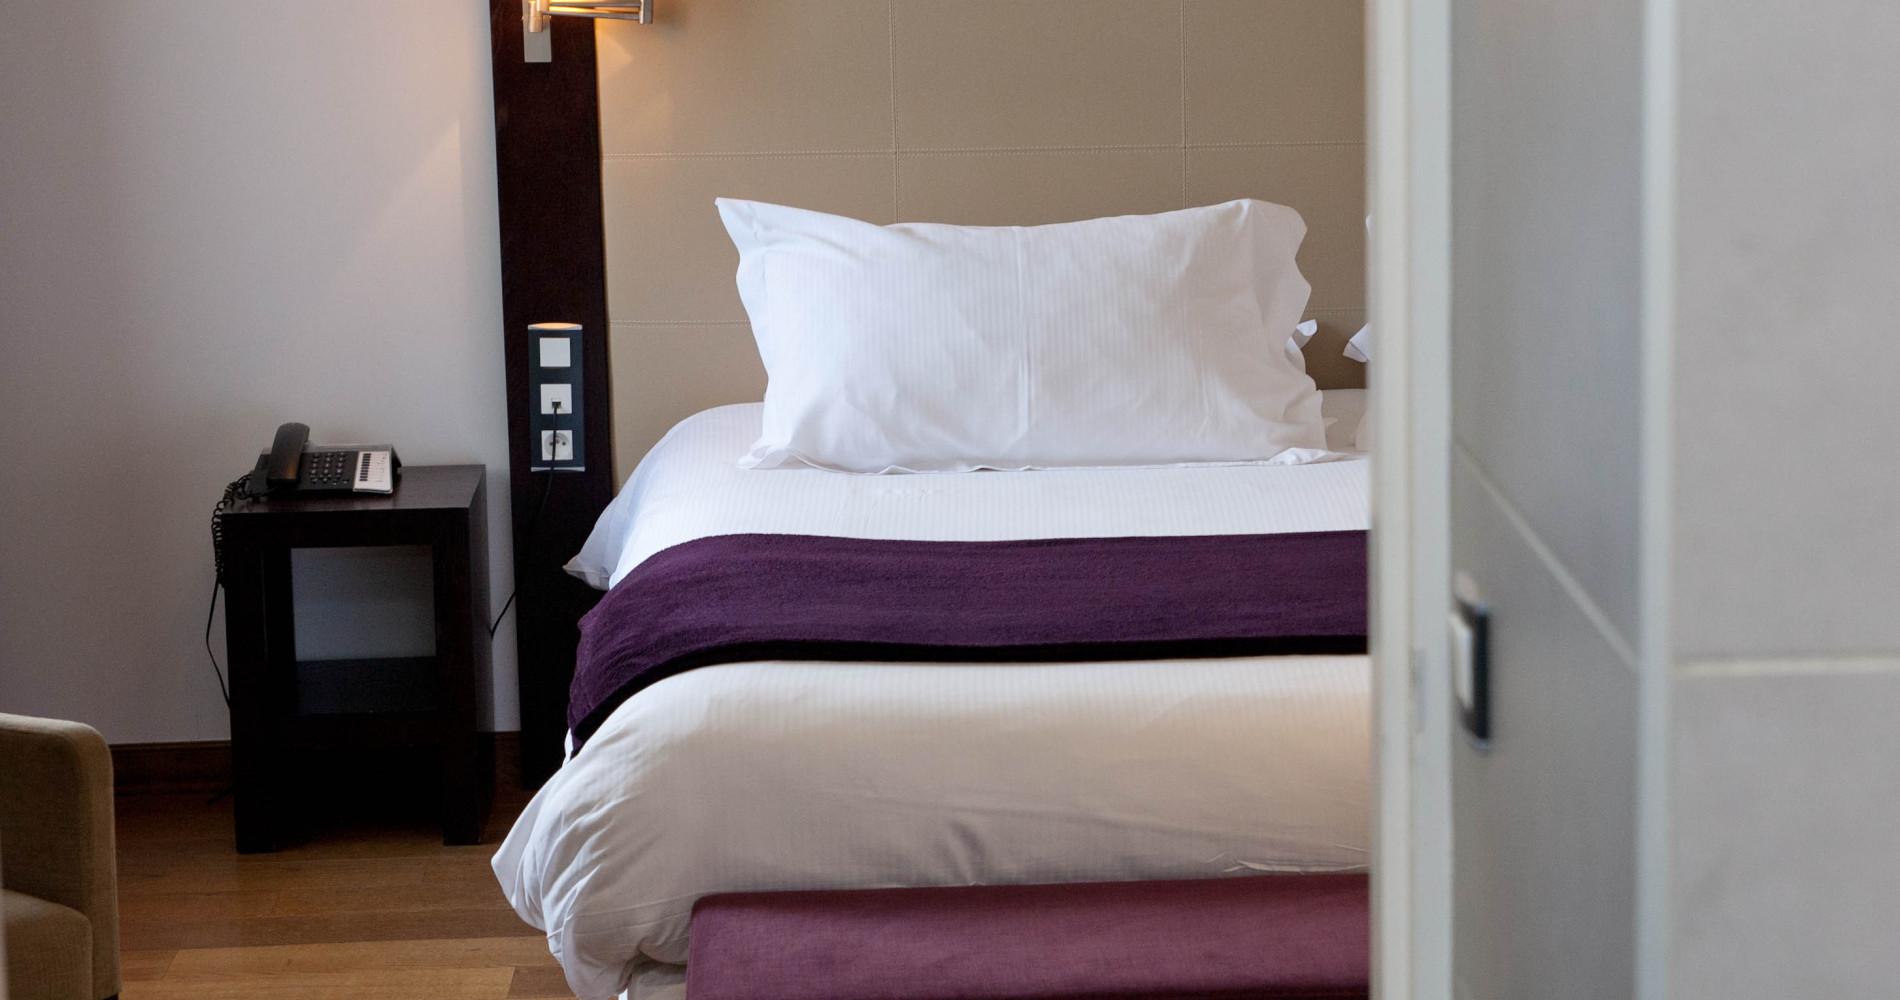 chambres de l 39 hotel 4 toiles la ferme de bourran rodez aveyron. Black Bedroom Furniture Sets. Home Design Ideas